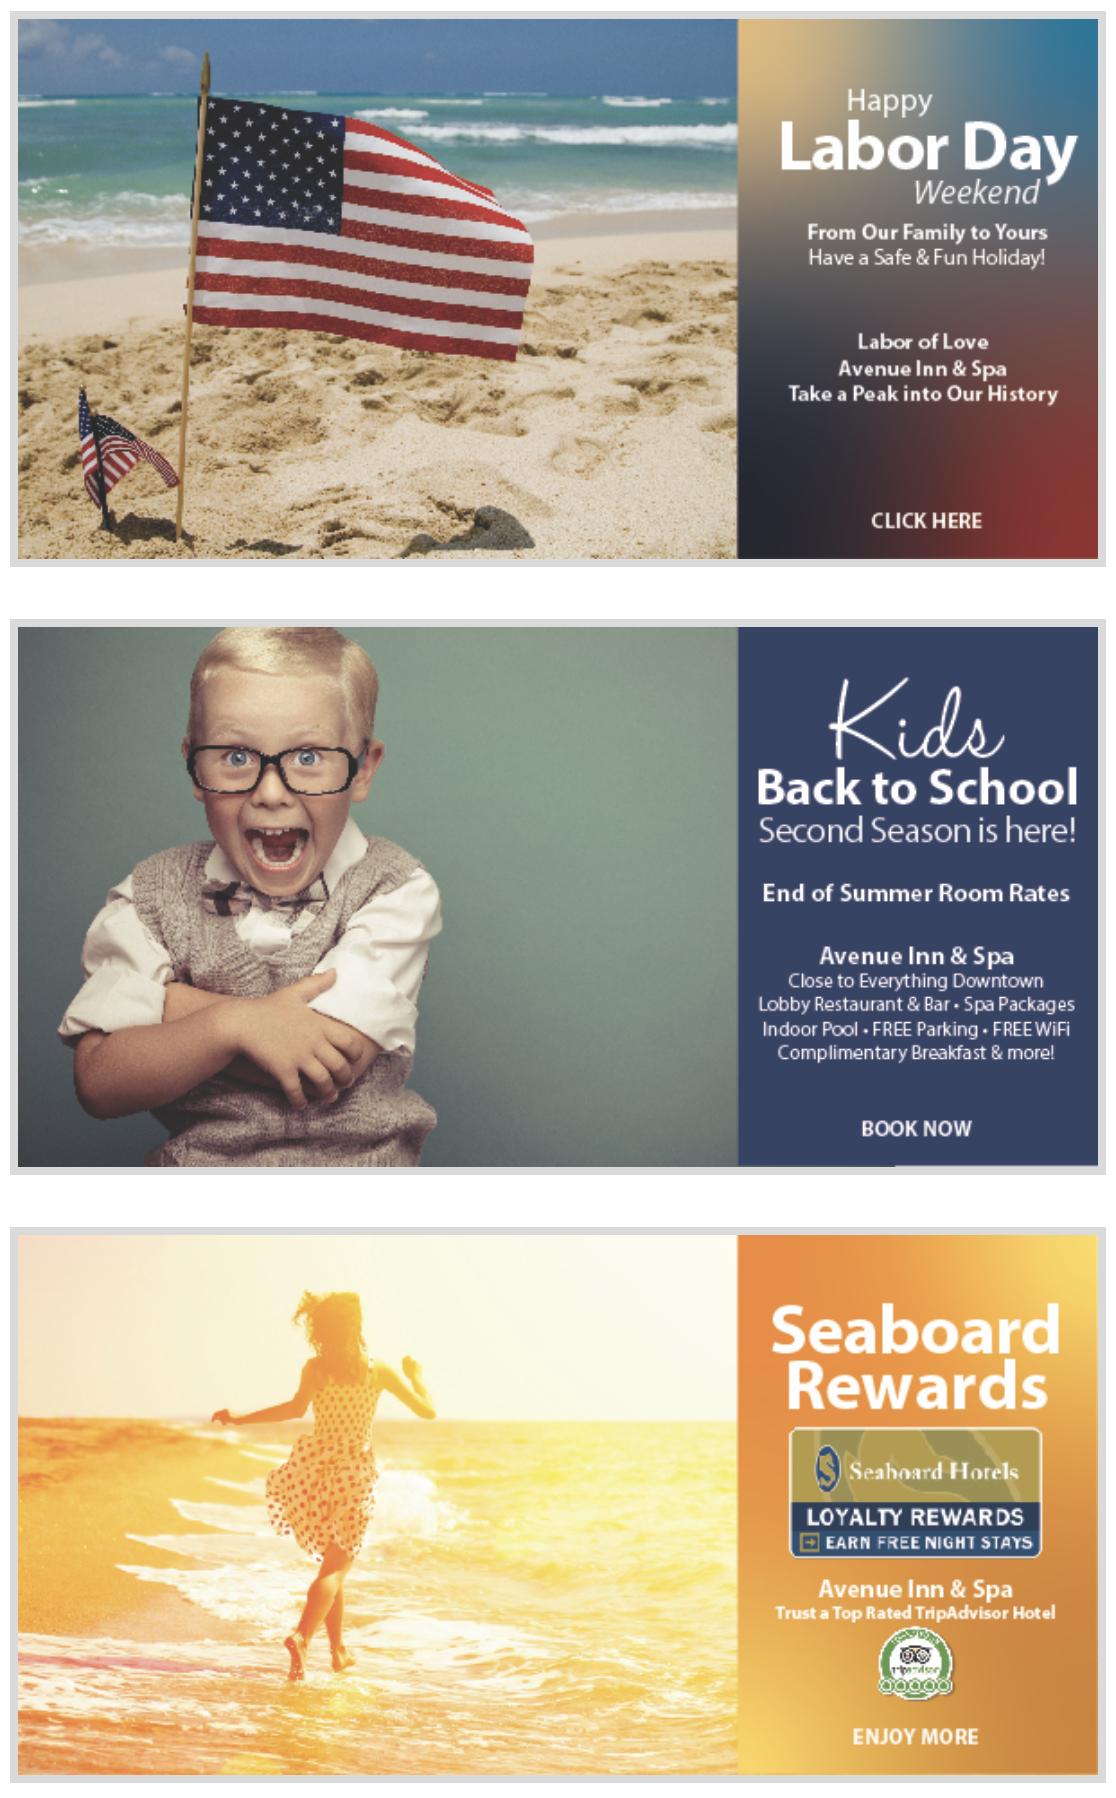 Avenue Inn & Spa email marketing by iKANDE web design